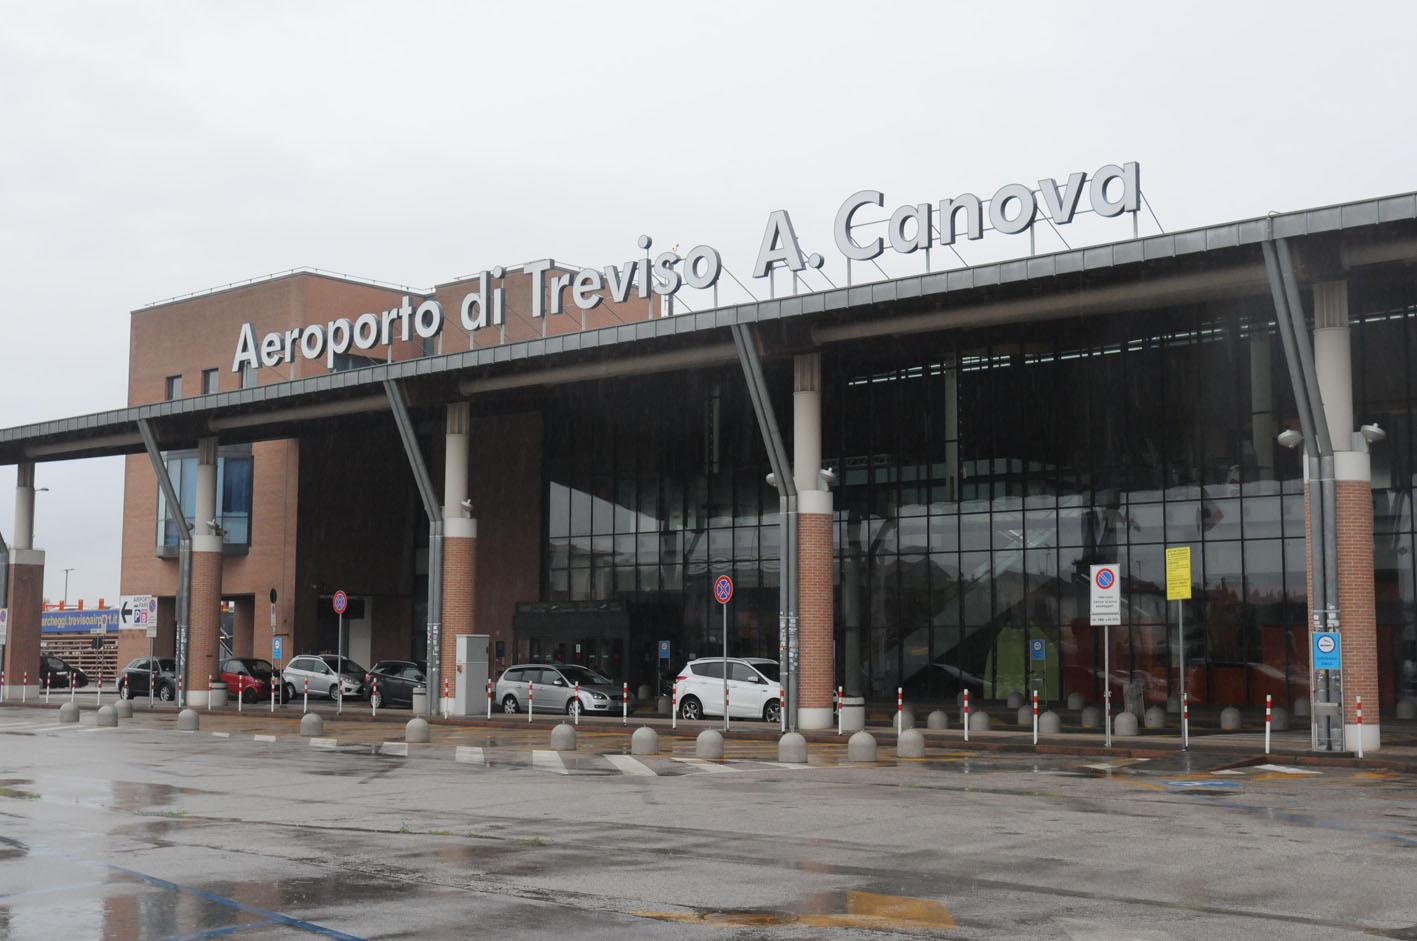 Offerte Lavoro Architetto Treviso coronavirus in veneto, le ultime notizie - corrieredelveneto.it